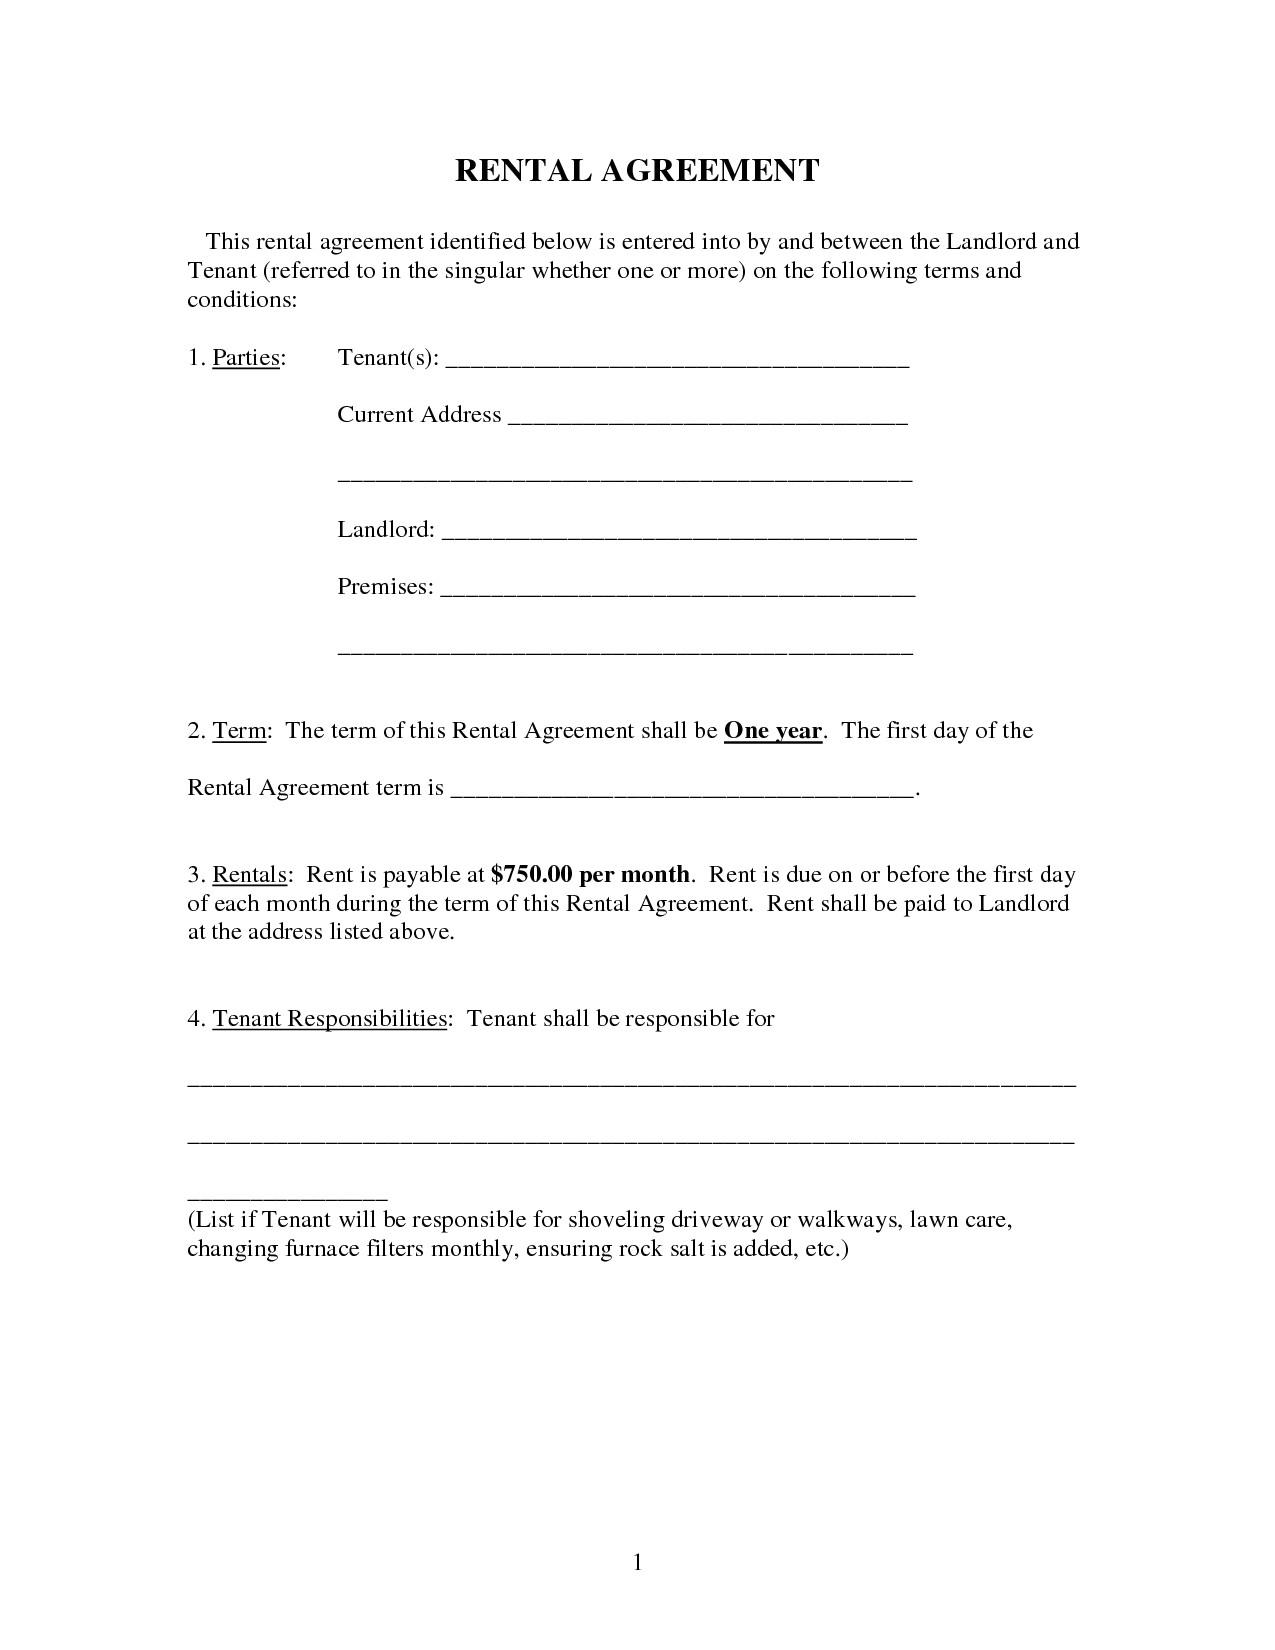 60850 landlord rental agreement form free